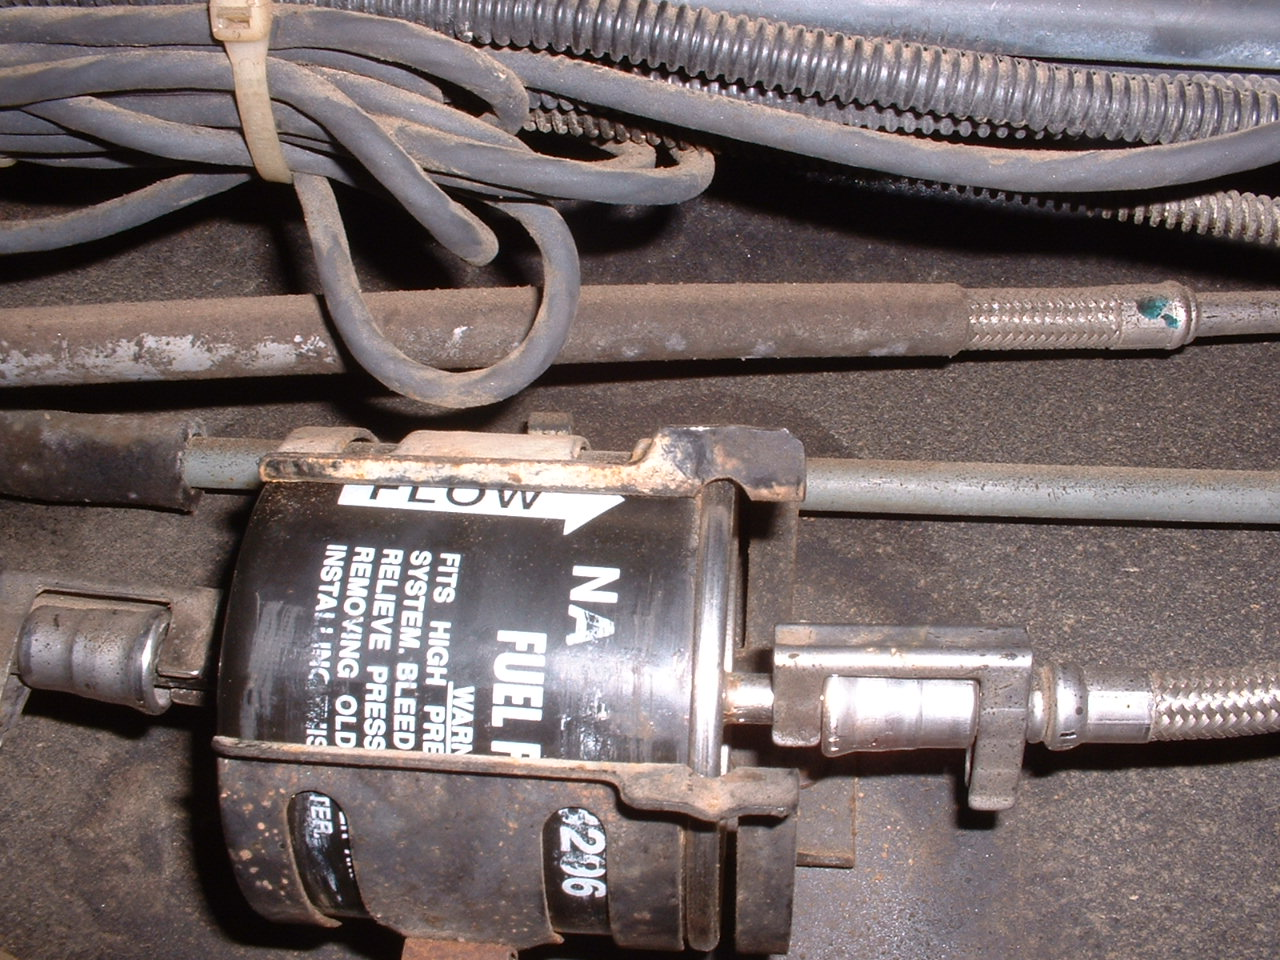 94 Mercury Topaz Fuse Box Manual Guide Wiring Diagram 91 Ford Elsalvadorla 1994